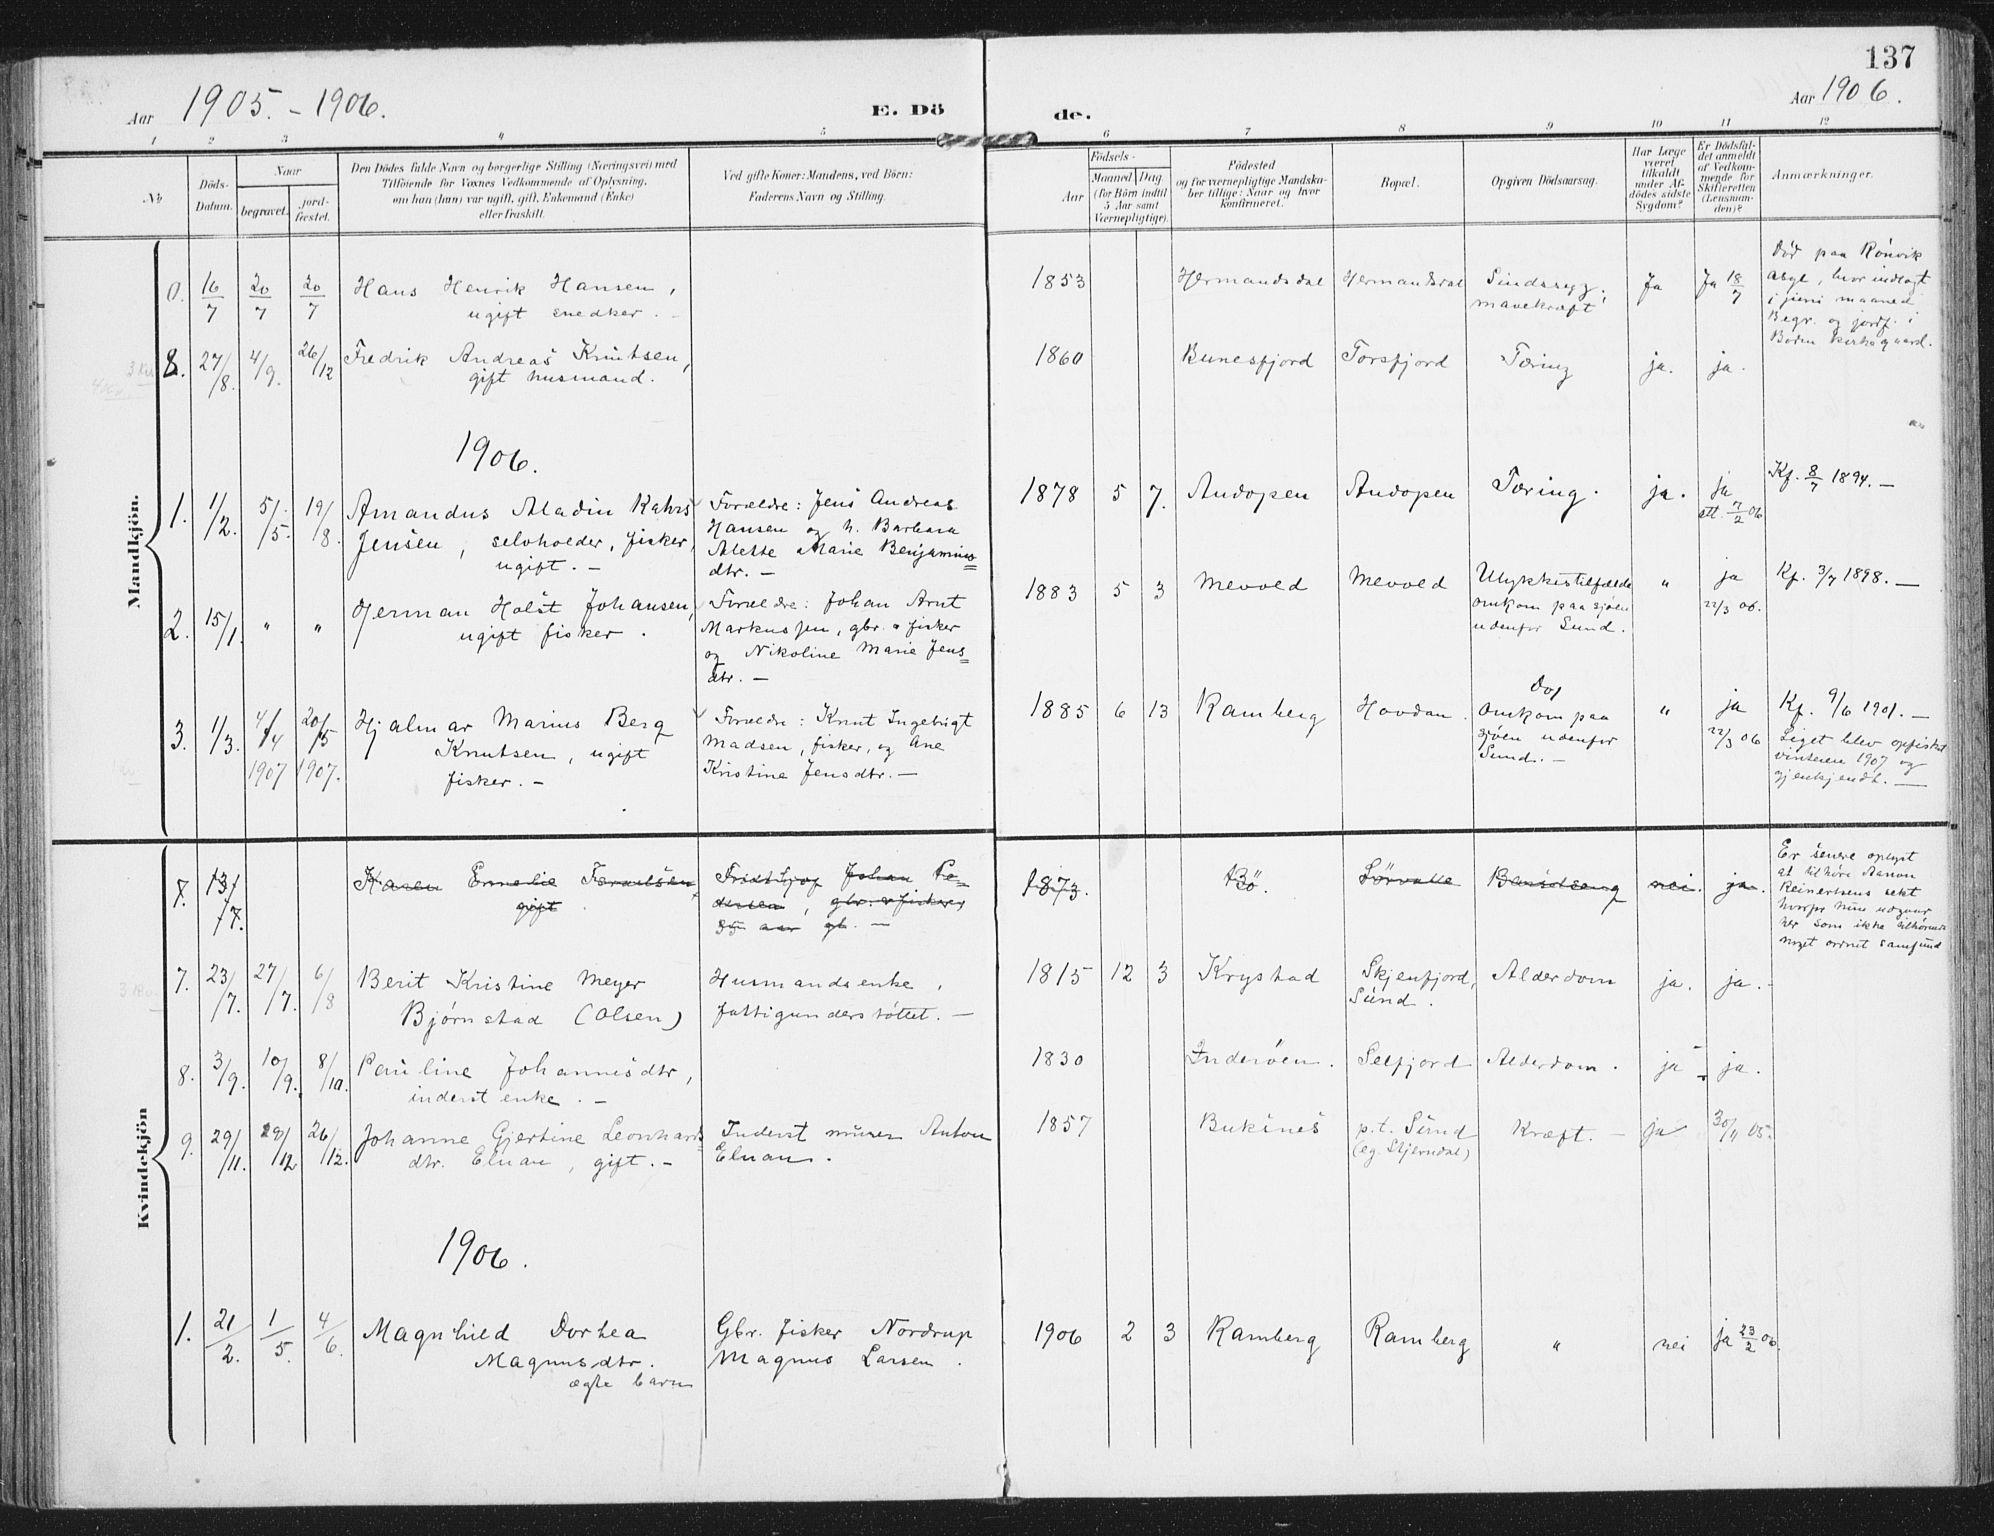 SAT, Ministerialprotokoller, klokkerbøker og fødselsregistre - Nordland, 885/L1206: Ministerialbok nr. 885A07, 1905-1915, s. 137